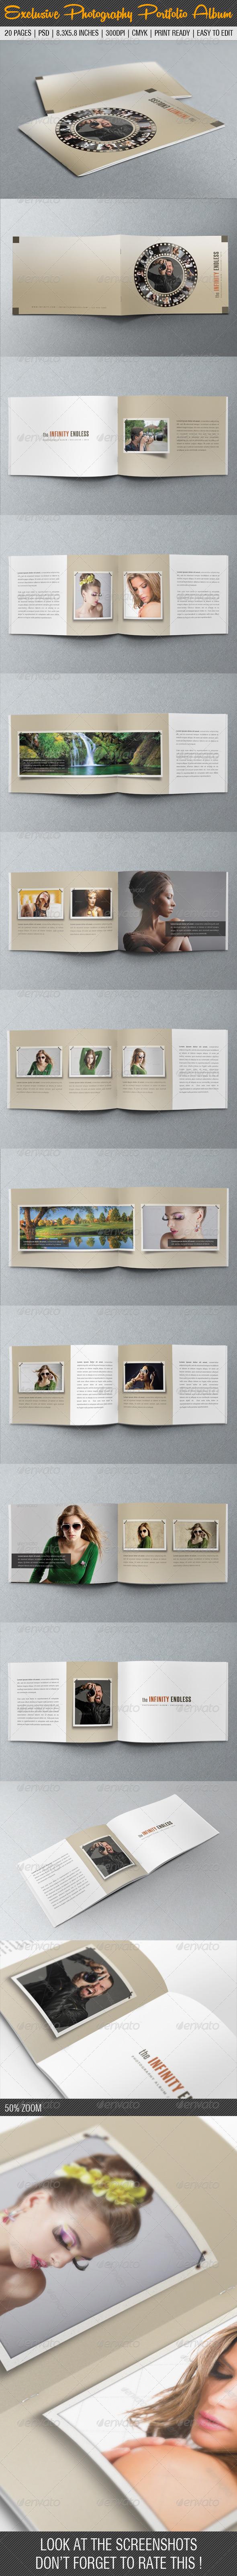 Exclusive Photography Portfolio Album 04 - Photo Albums Print Templates